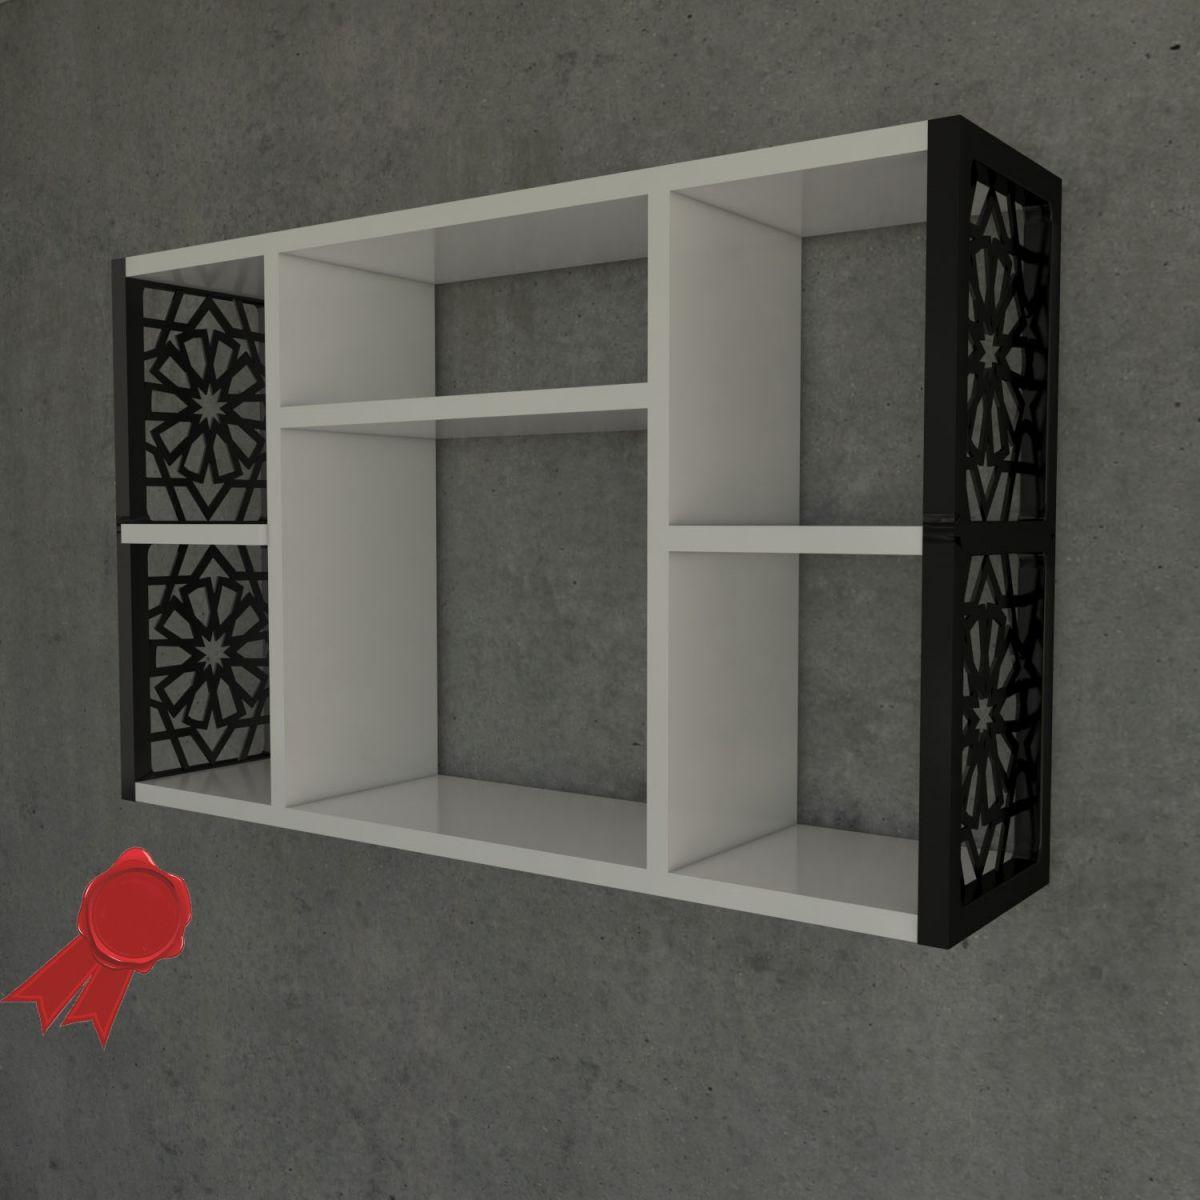 Raft de perete pentru baie- bucatarieLulu Homs80 x 50 x 20 cm, Alb-negru